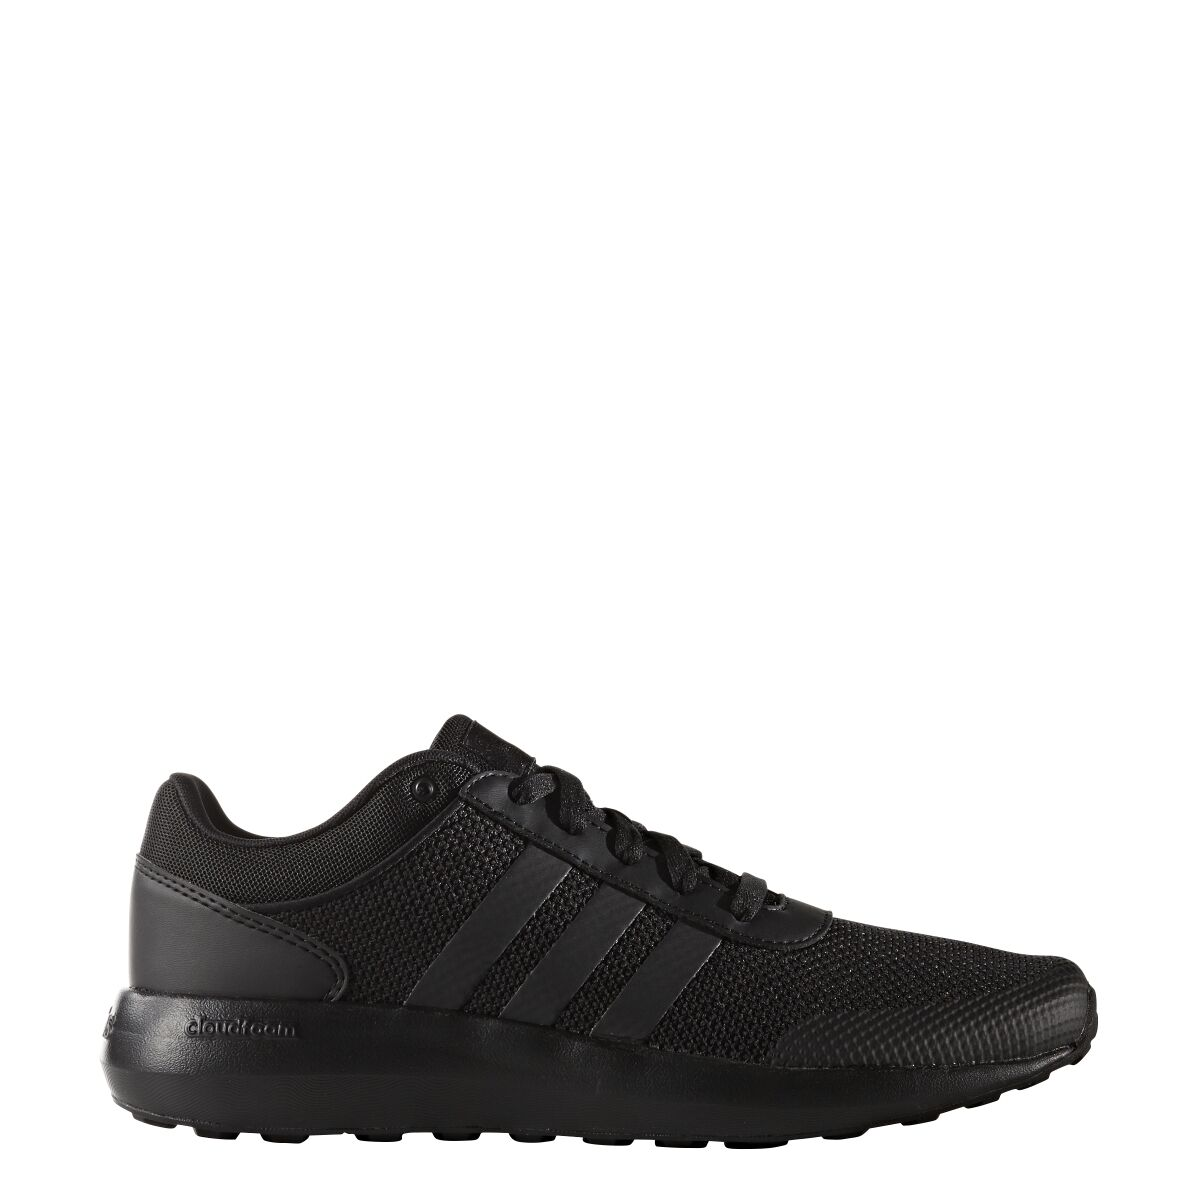 Mens Adidas NEO Cloudfoam Race Black Sneaker Athletic Sport Shoes B74372 10-12.5